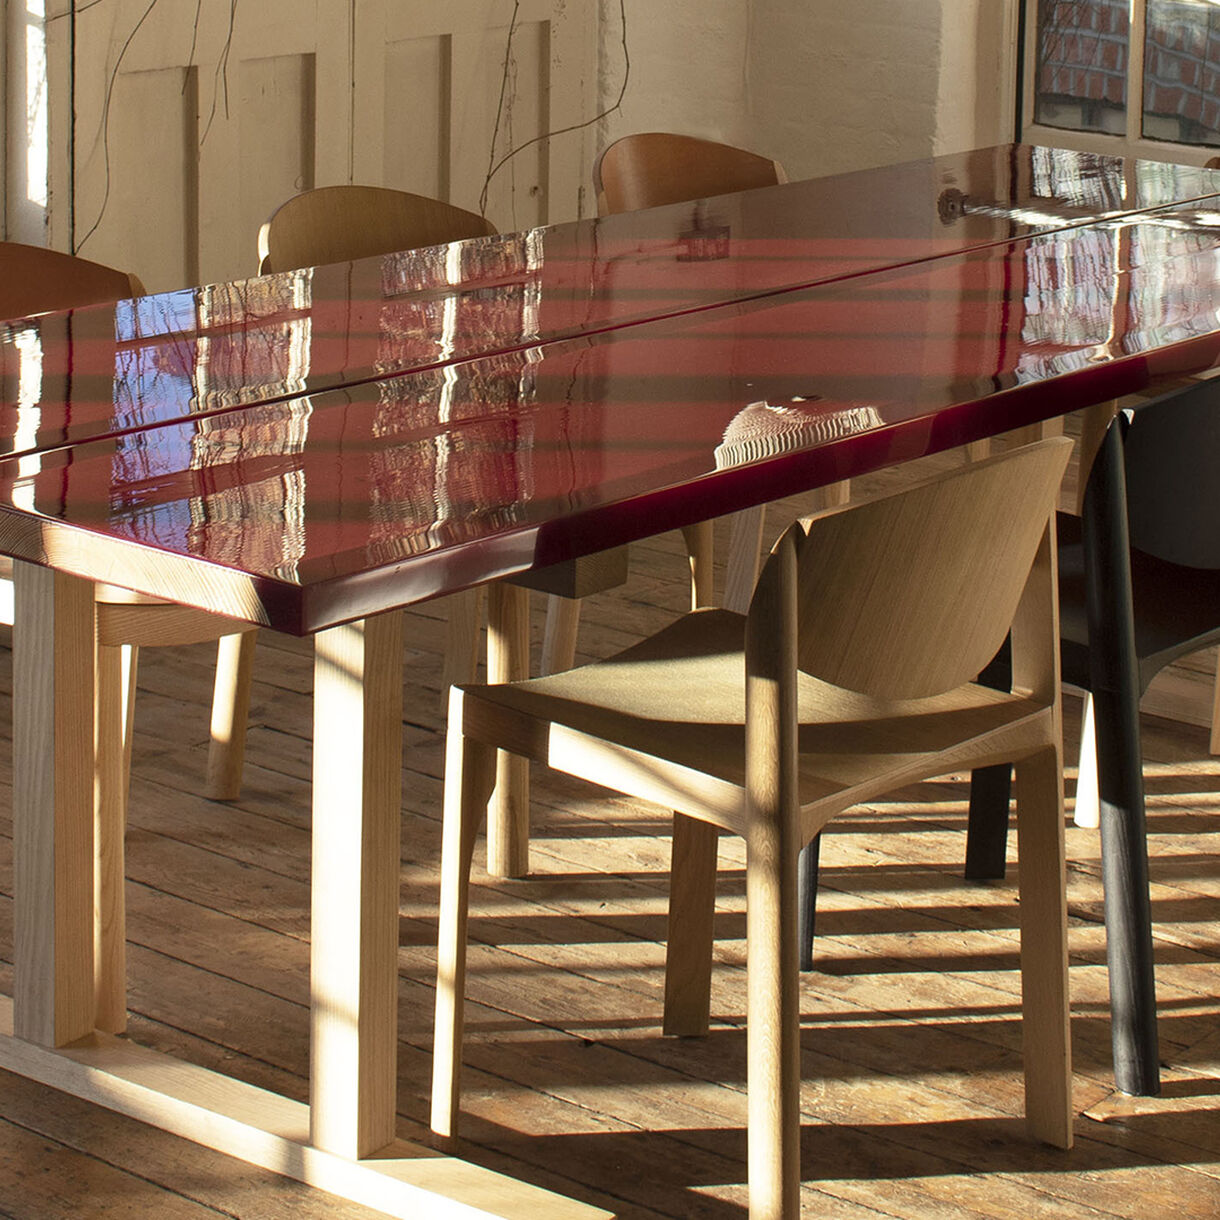 Udukuri Table, Lifestyle